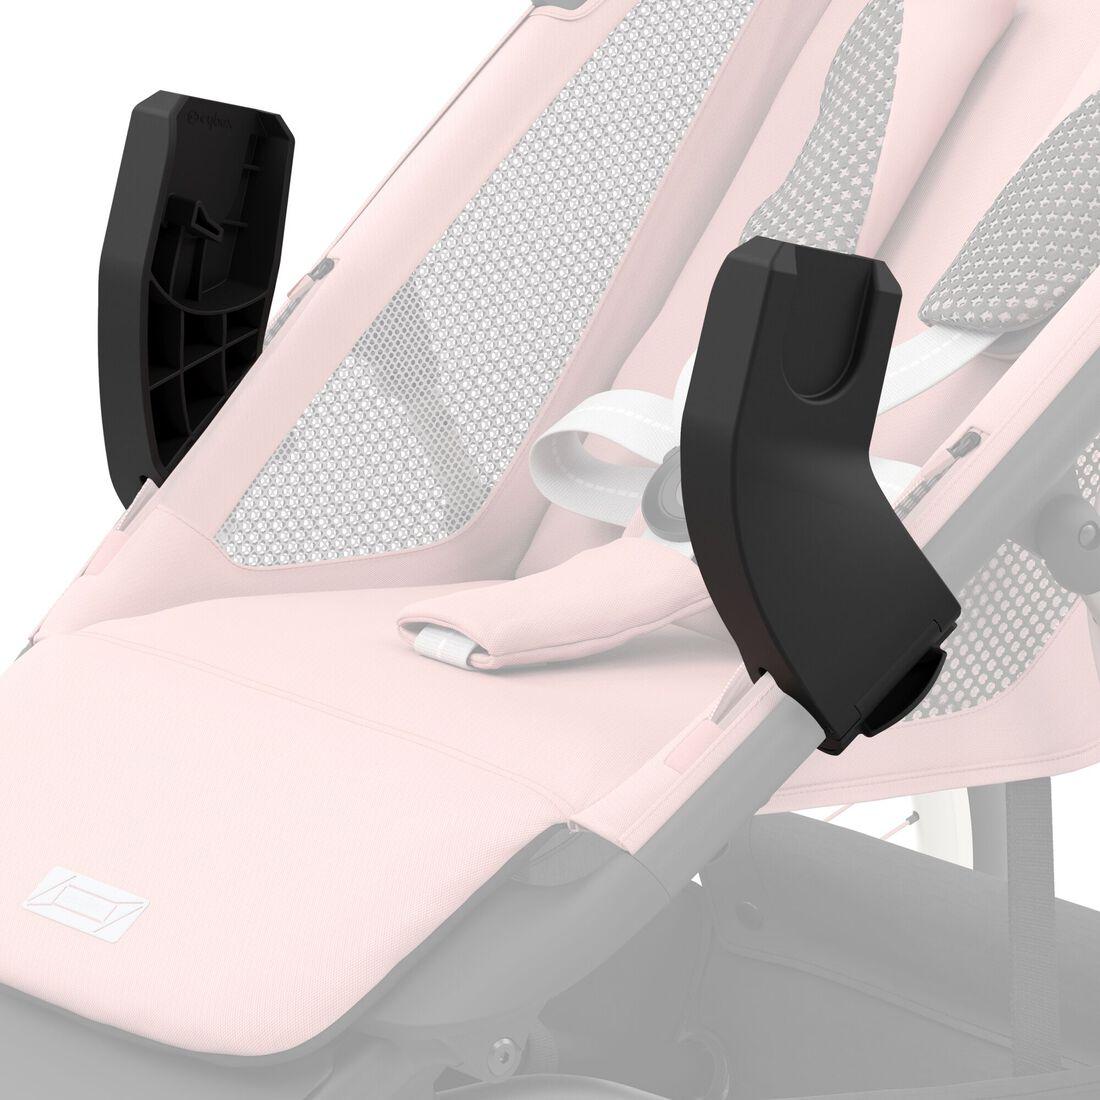 CYBEX Adapter Car Seat Avi - Black in Black large